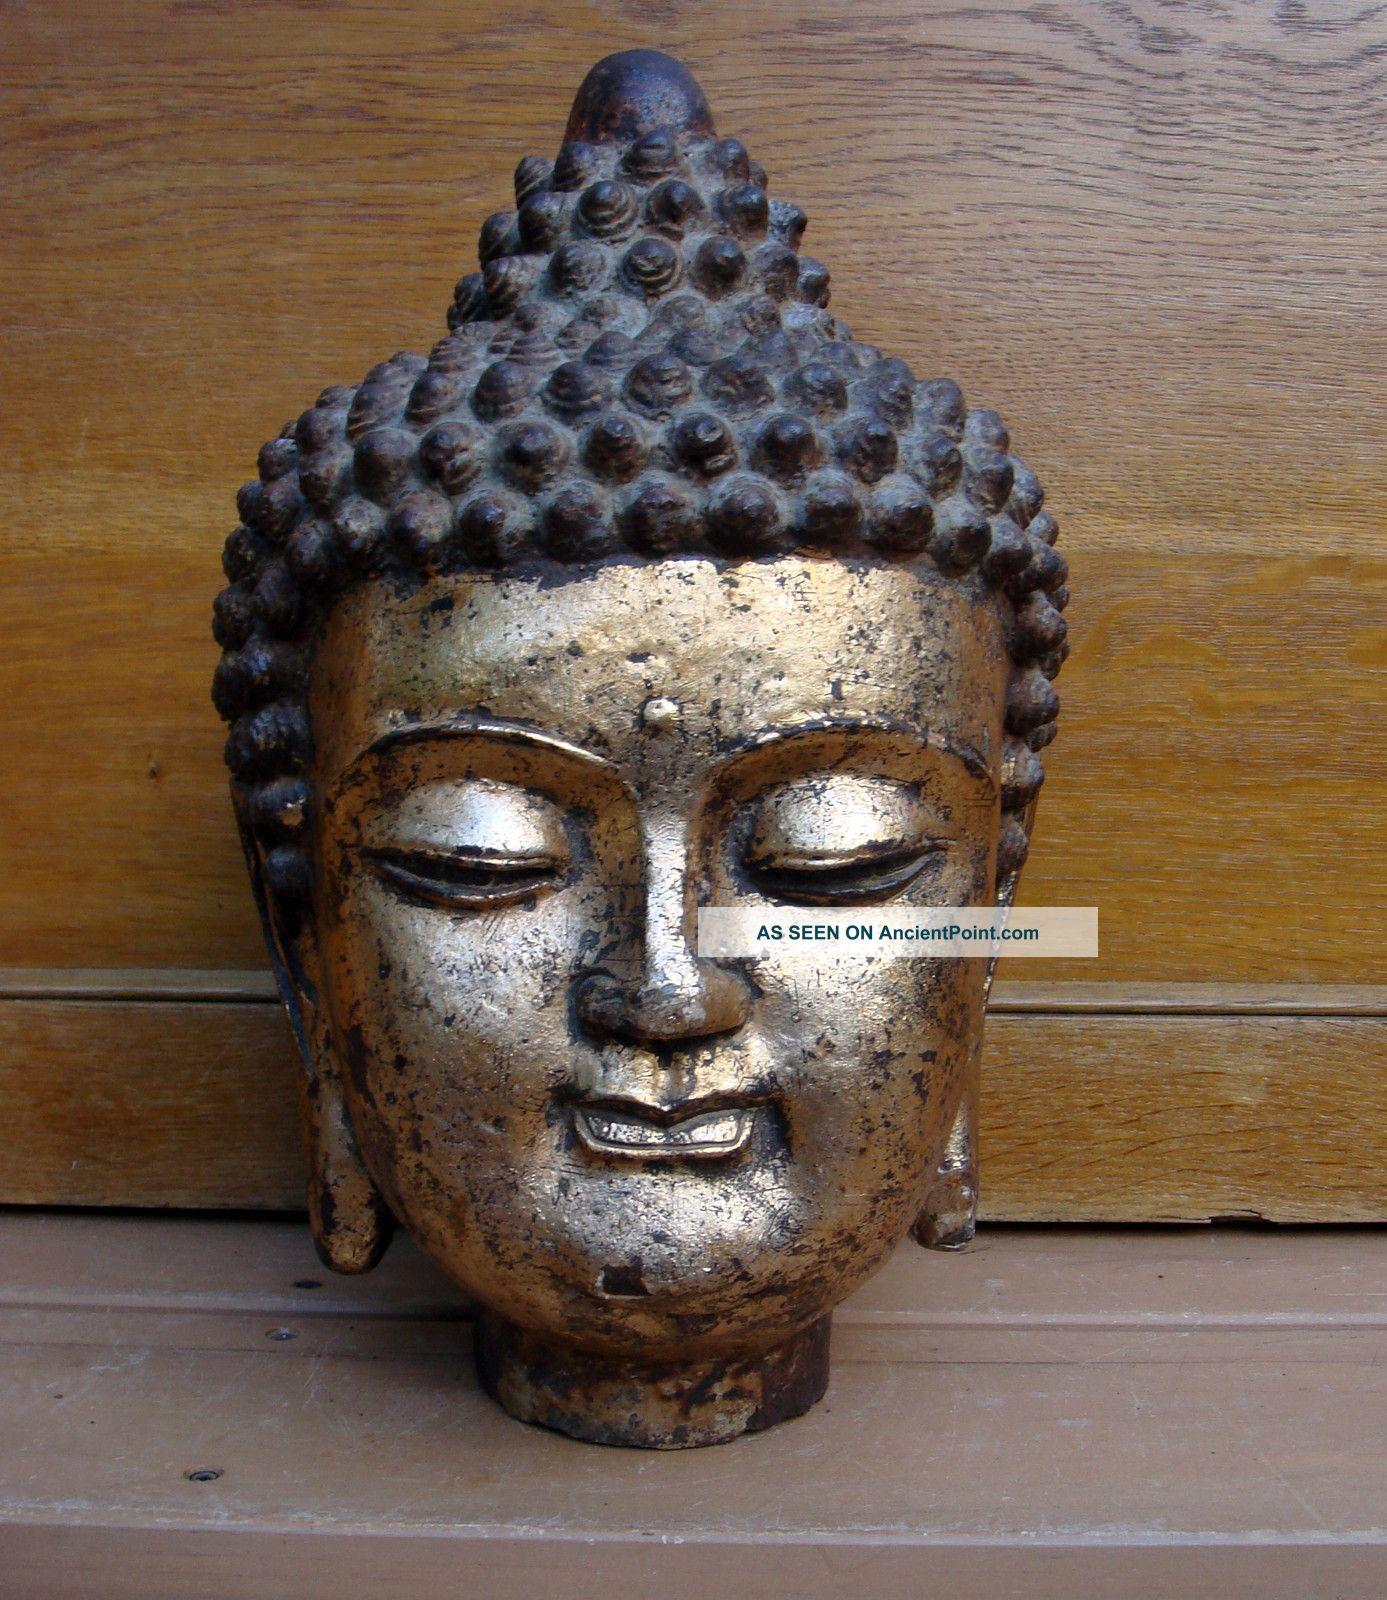 Antique Chinese Asian 19c Cast Iron Buddha Statue Bust Head Buddha photo